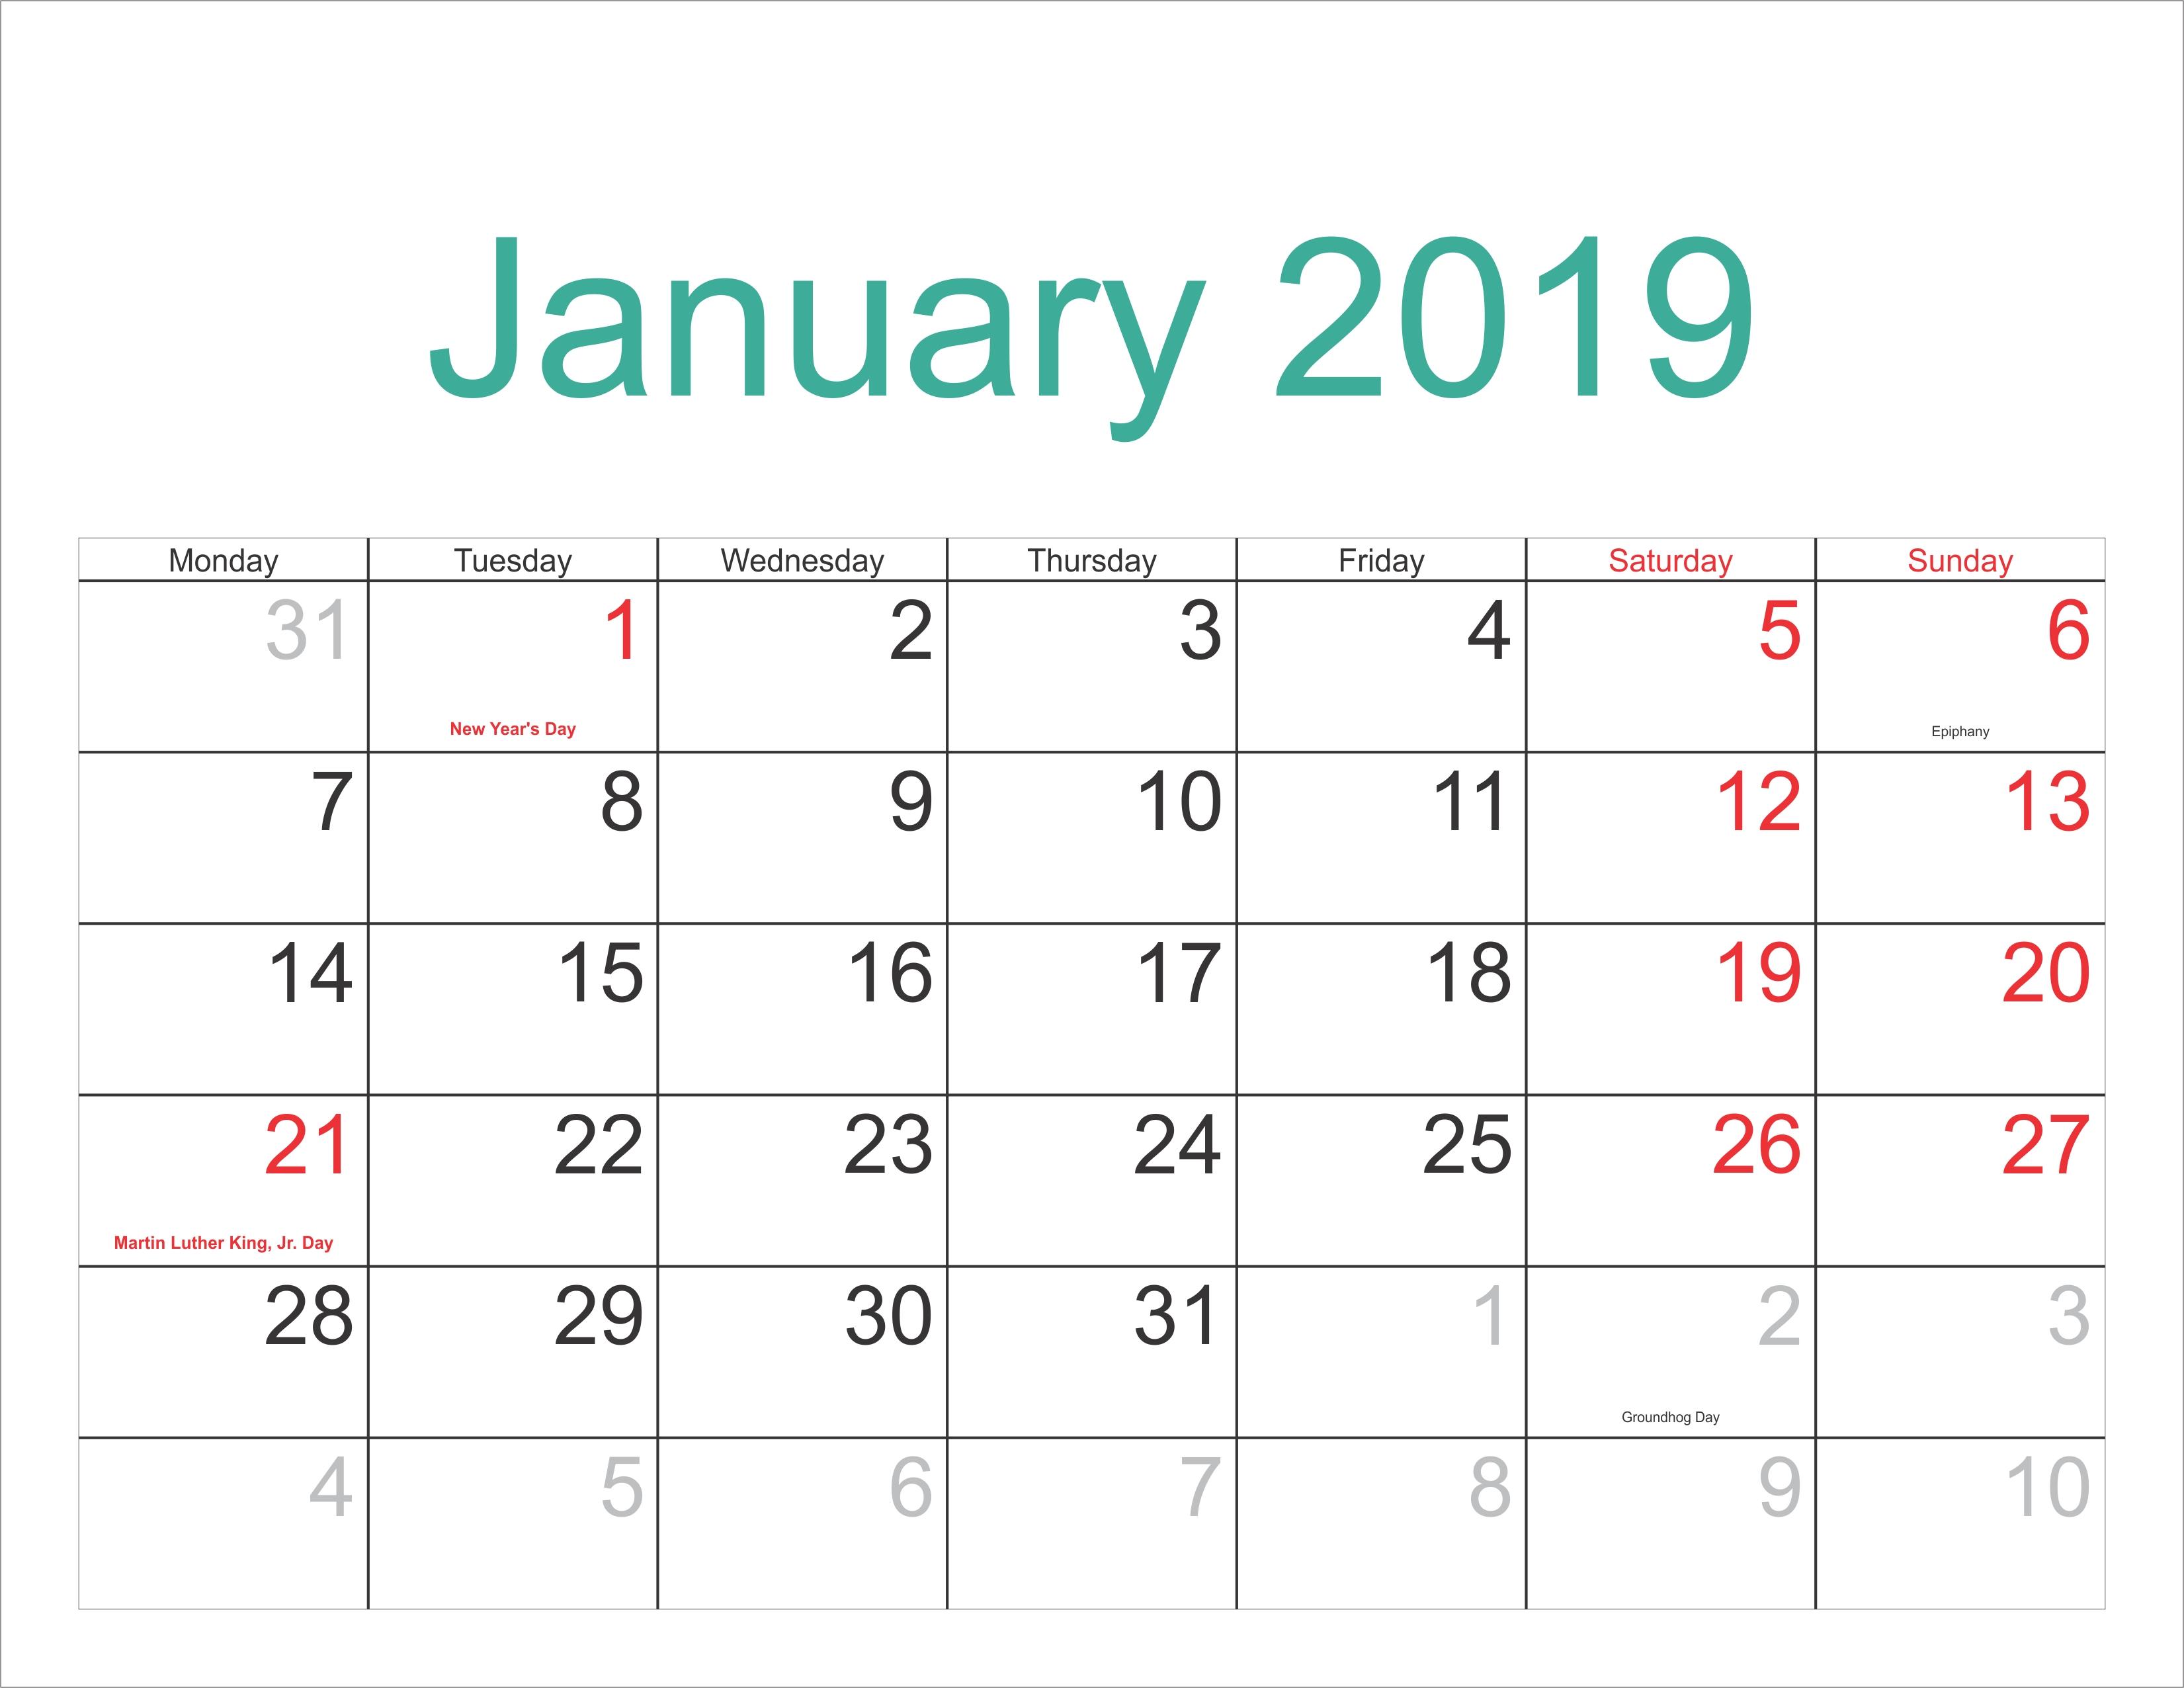 January 2019 Calendar Template With Holidays – Free Printable Calendar 2019 January With Holidays